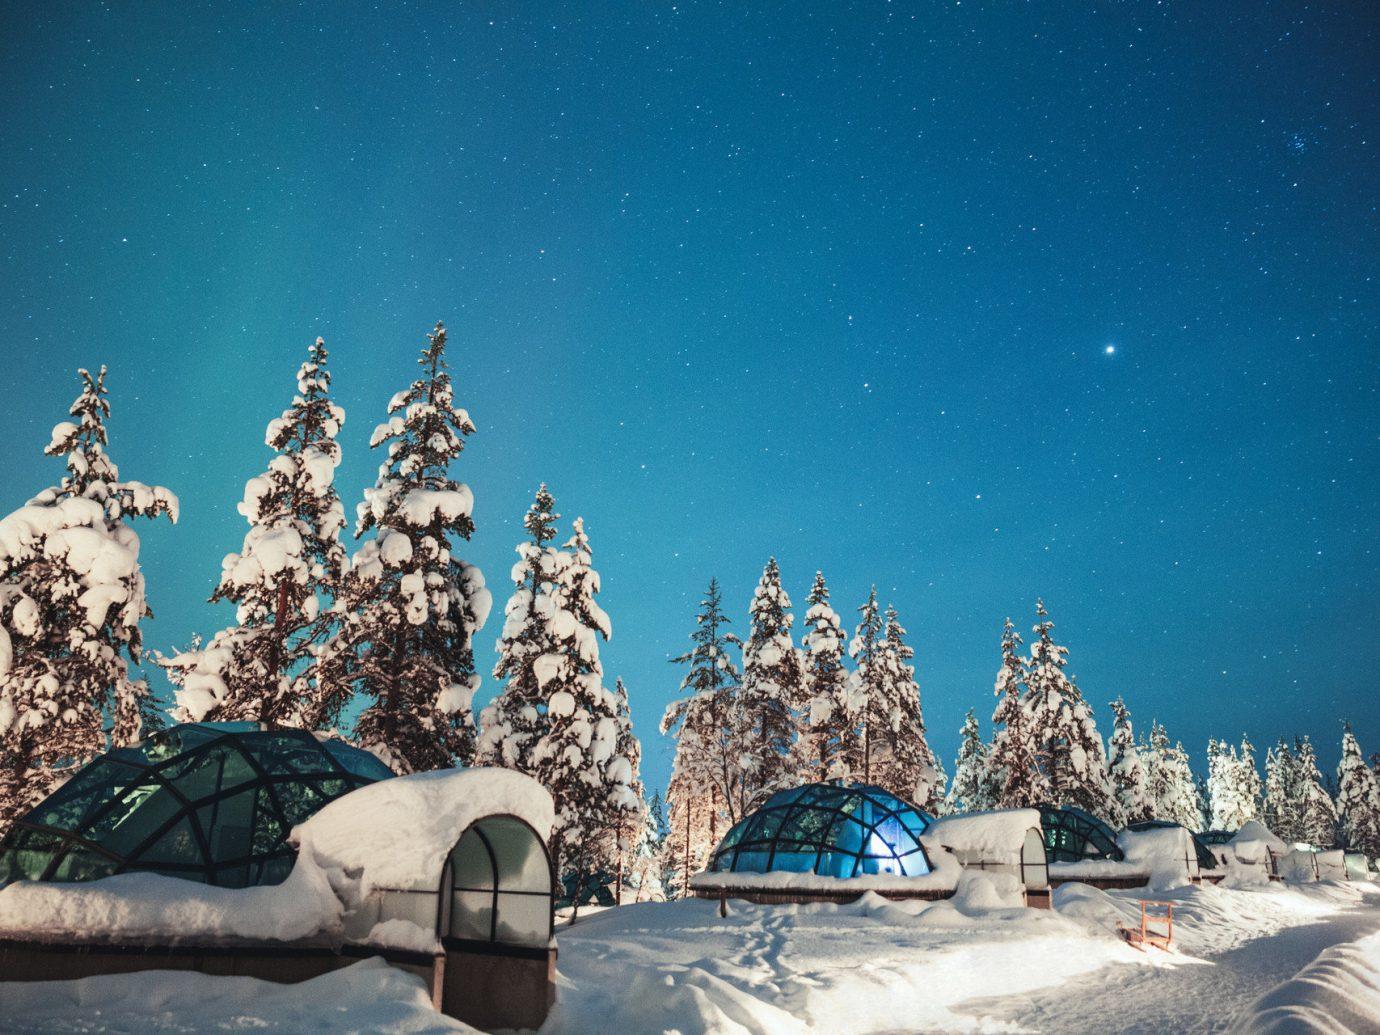 europe glass igloo glass igloos igloo igloos isolation night Outdoors remote snow Trip Ideas Winter outdoor ice